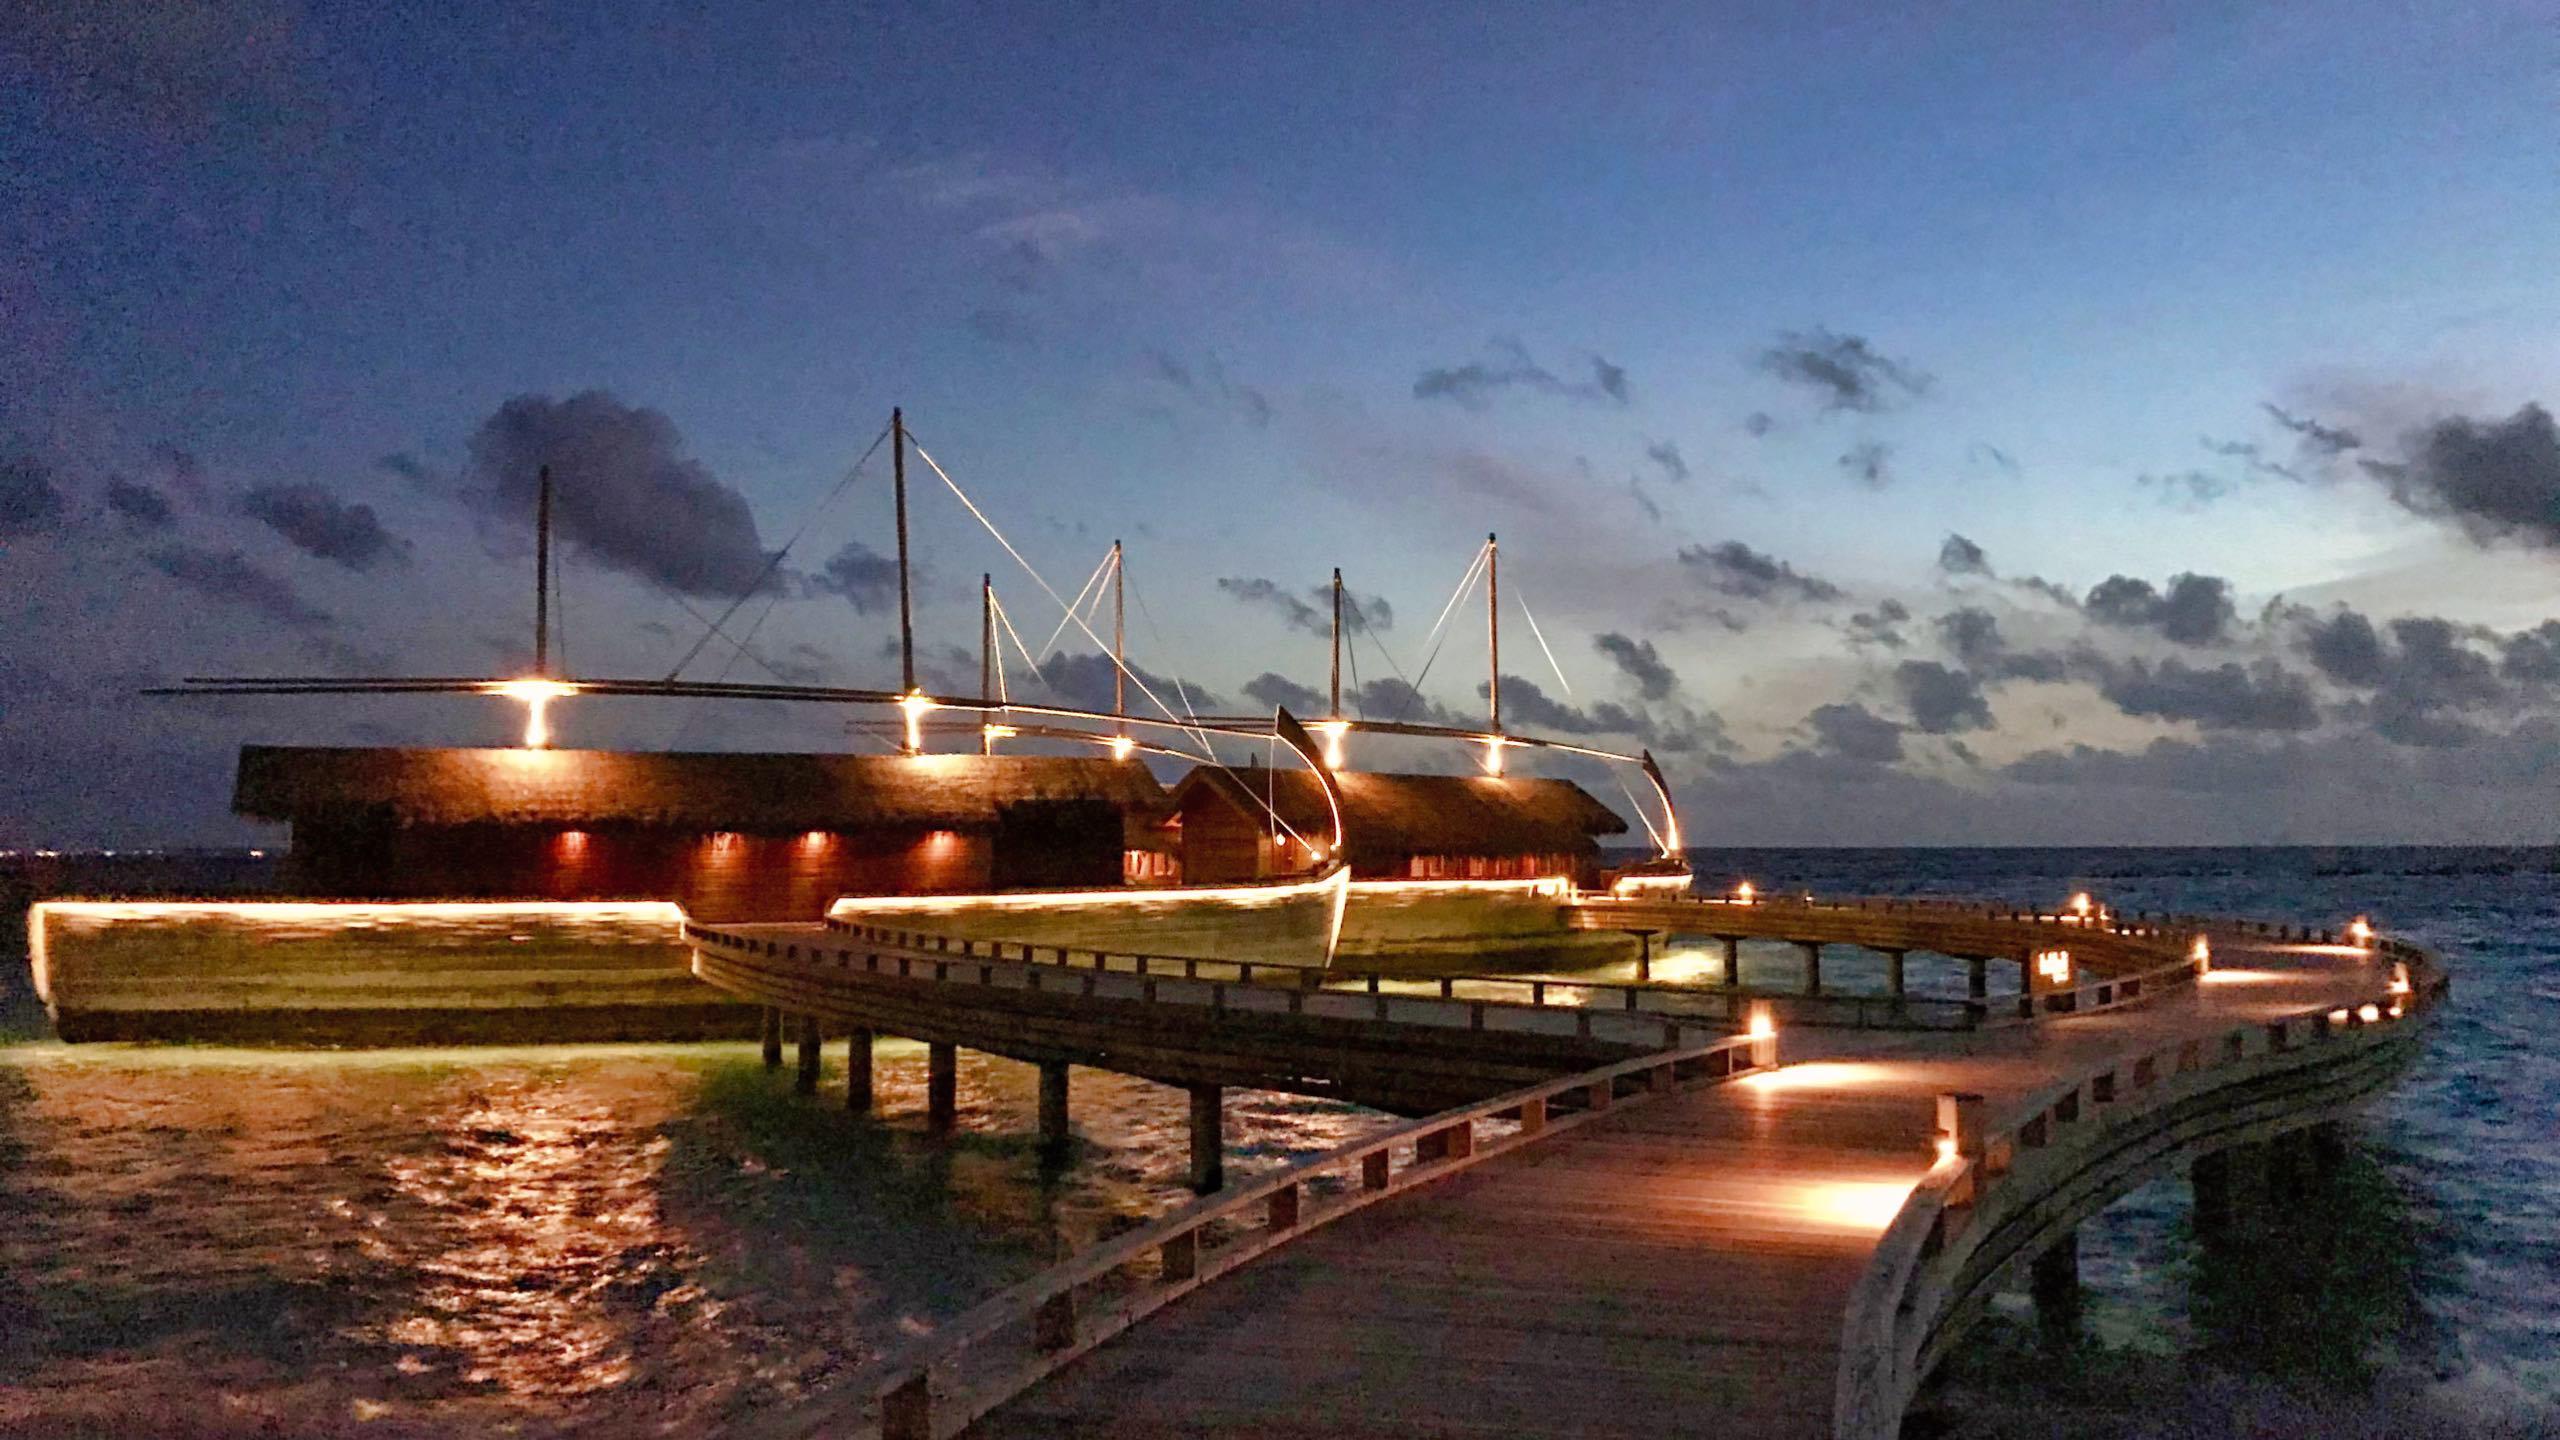 Milaidhoo Island Malediven Dhoni Restaurant bei Nacht